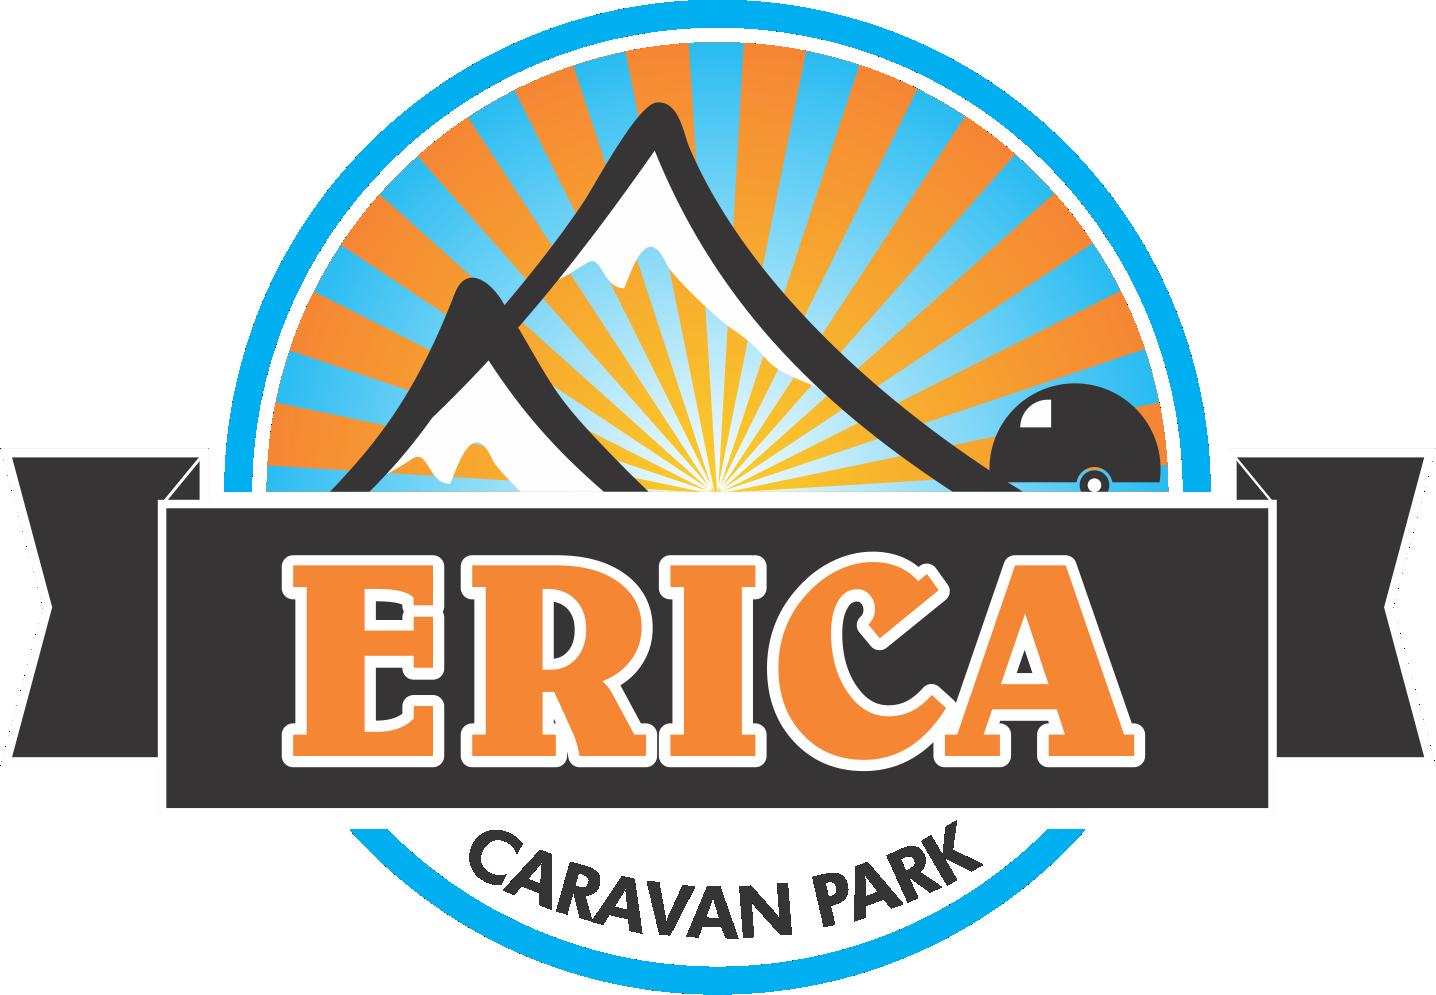 Erica Caravan Park